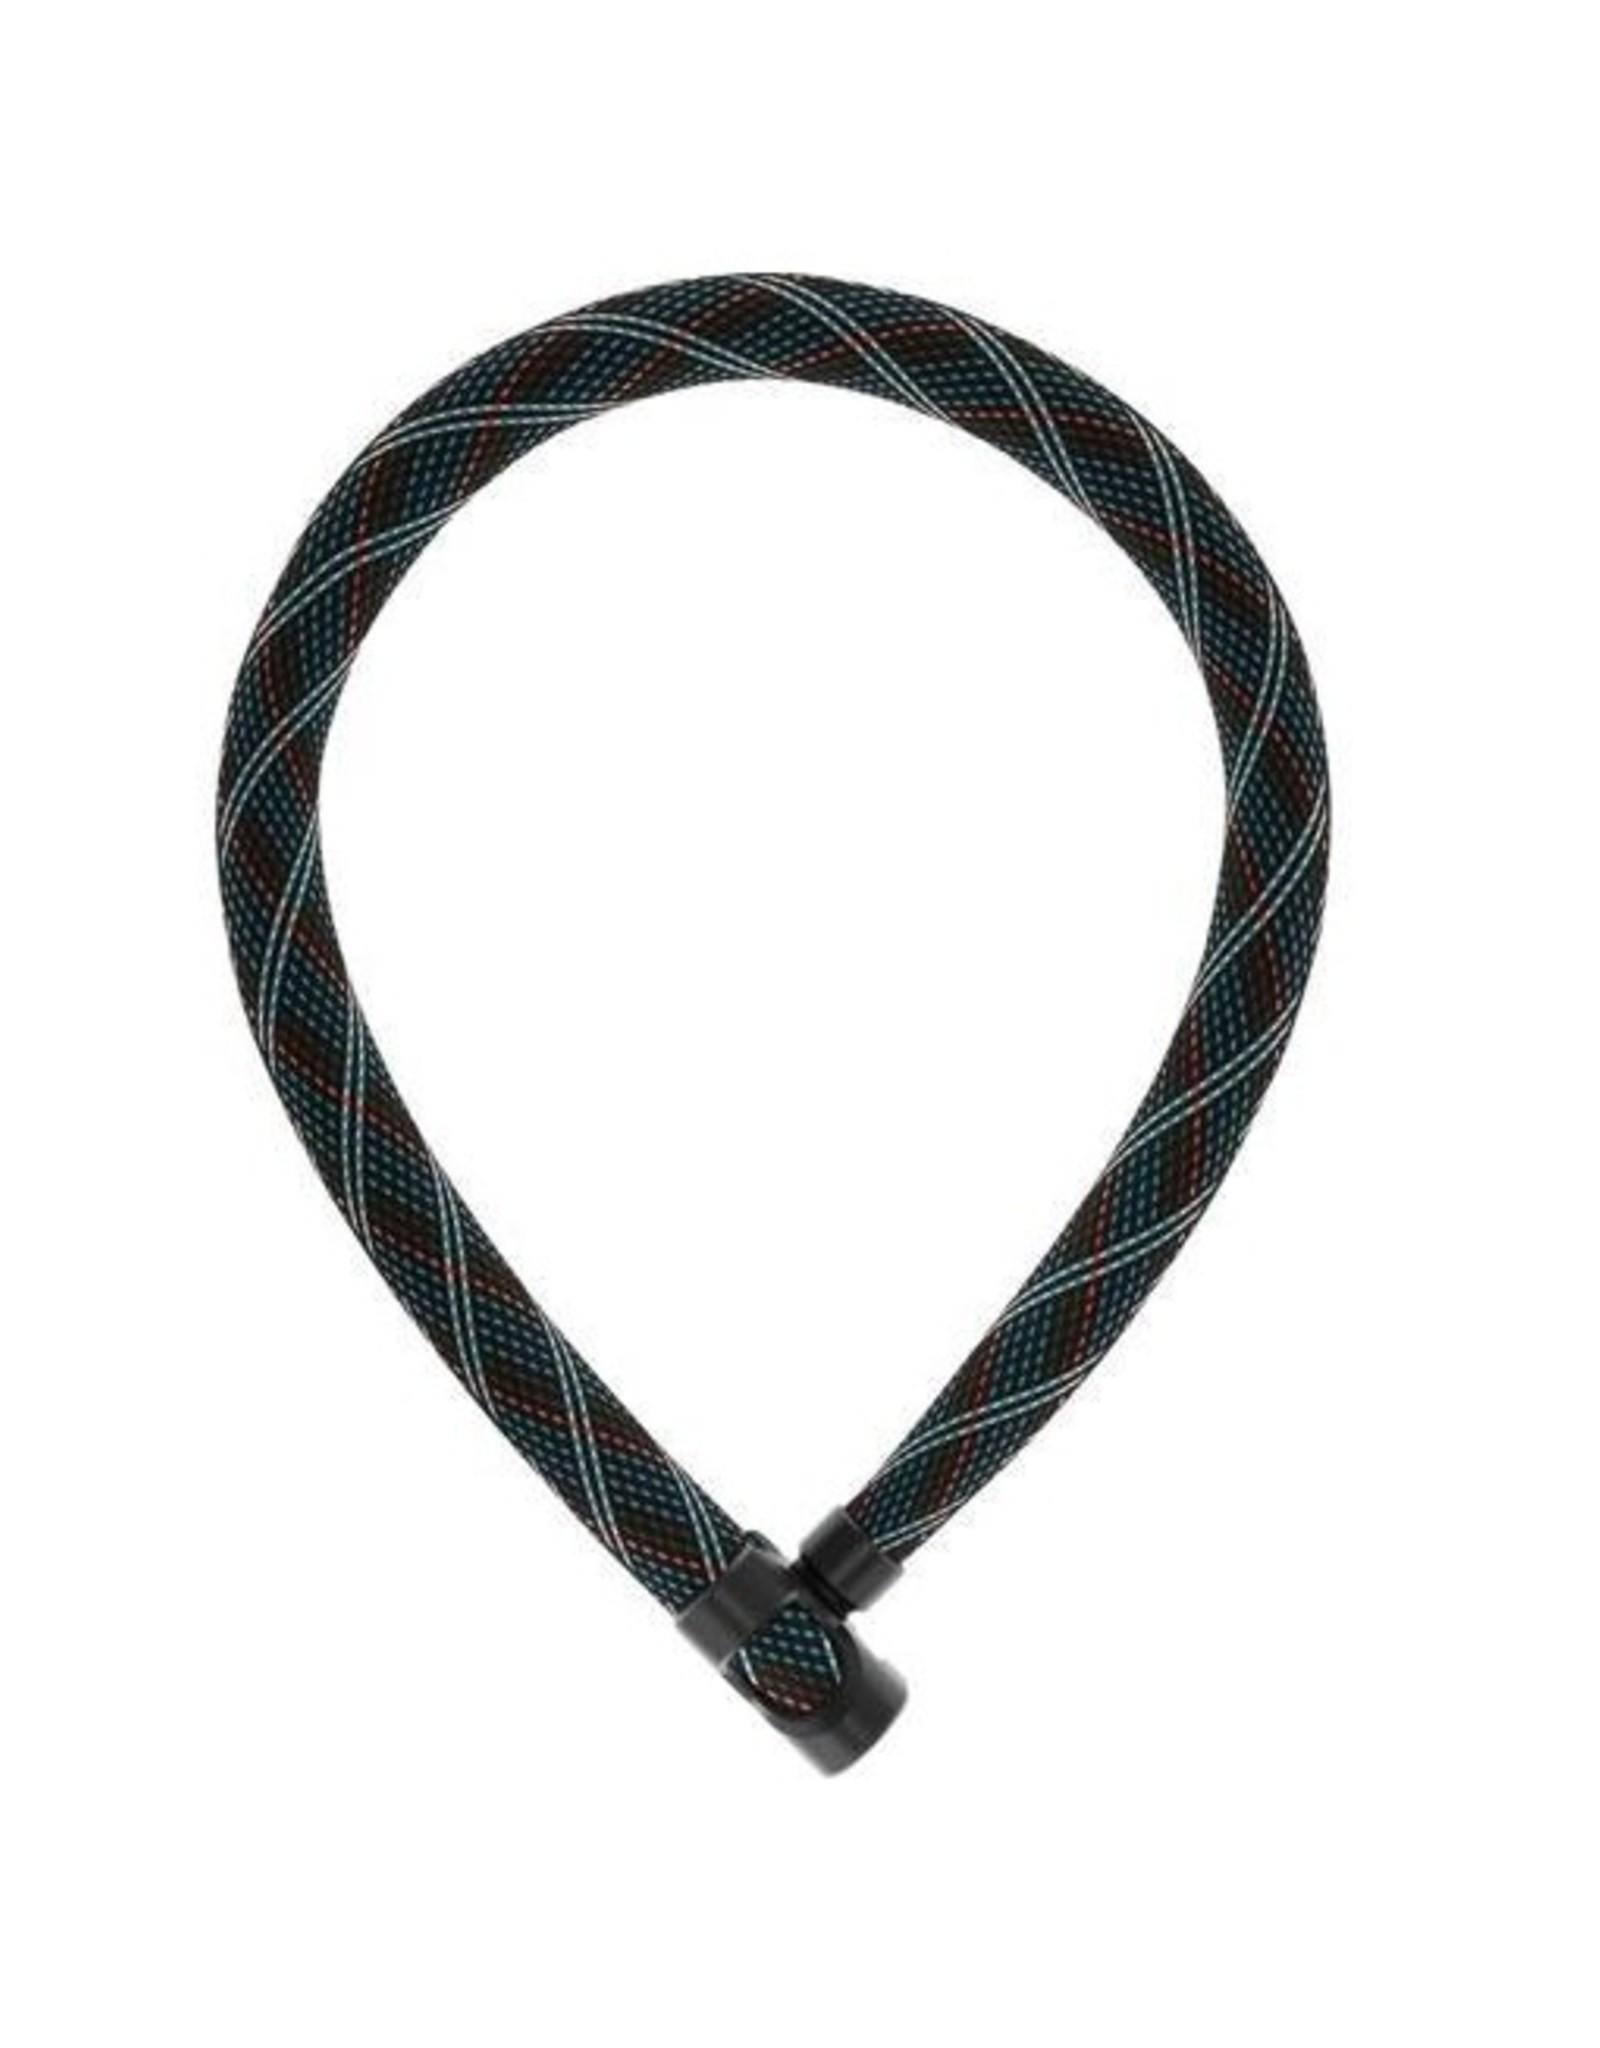 Lock - Abus Ivera 7210 3.6ft Chain Grey (Key)